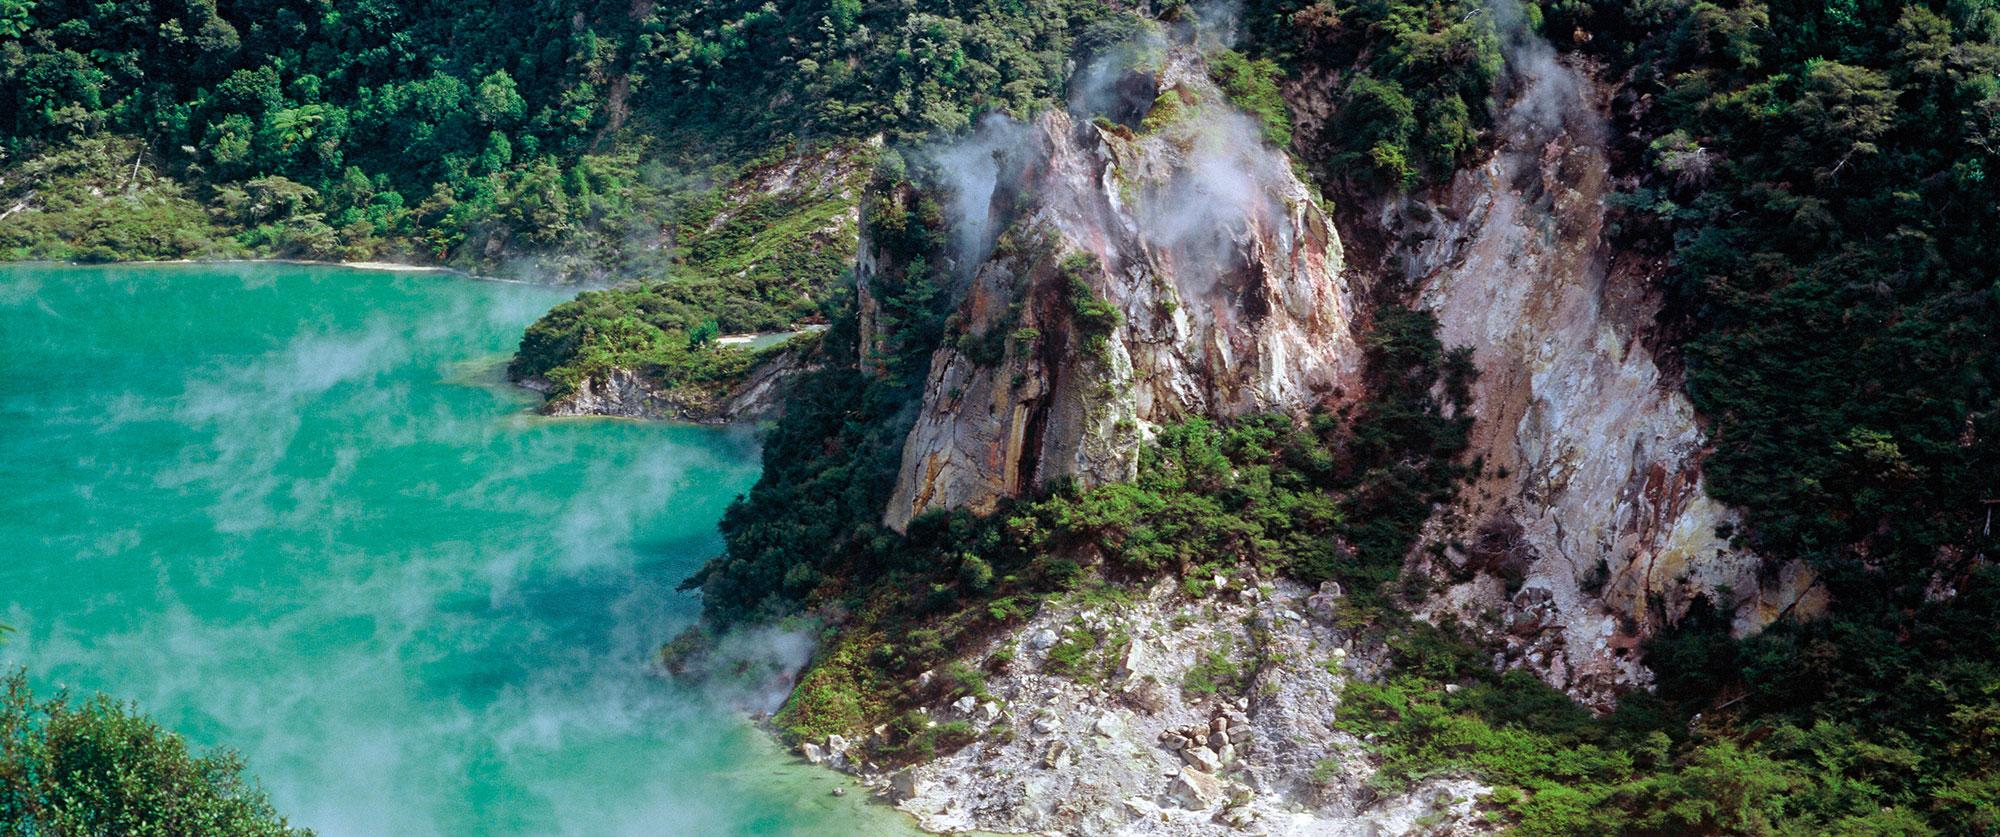 New Zealand Fiji Package Culture - Rotorua New Zealand